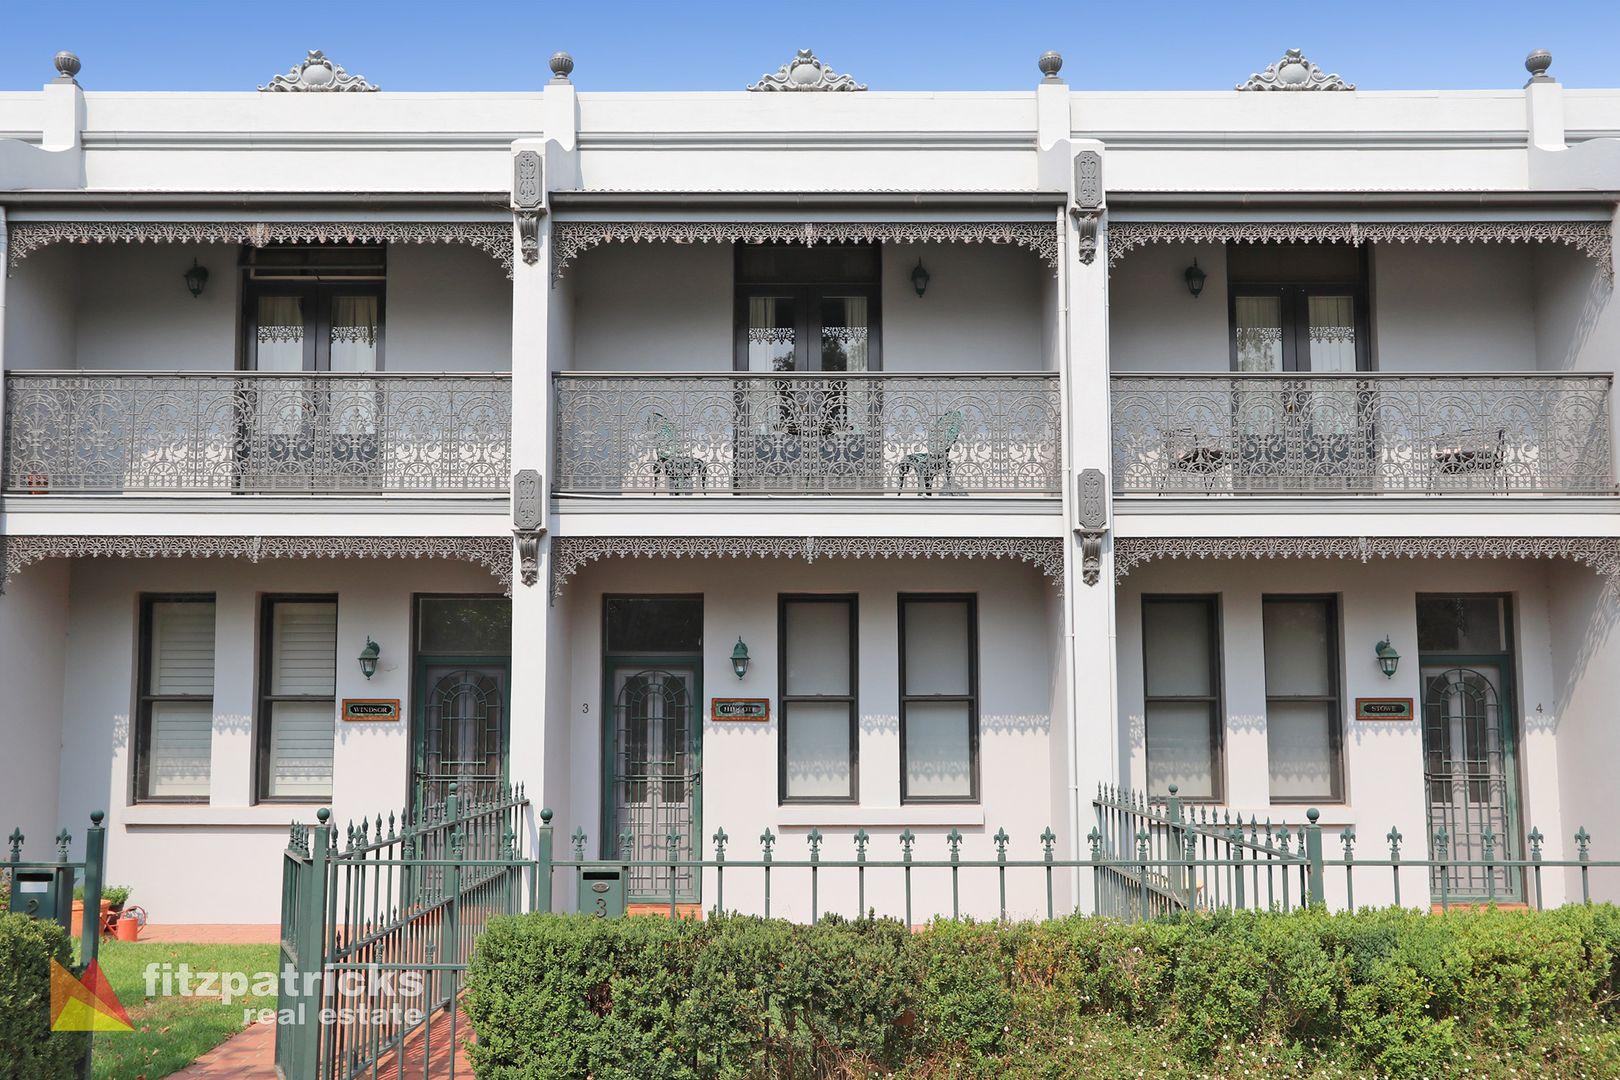 3/200 Fitzmaurice Street, Wagga Wagga NSW 2650, Image 0